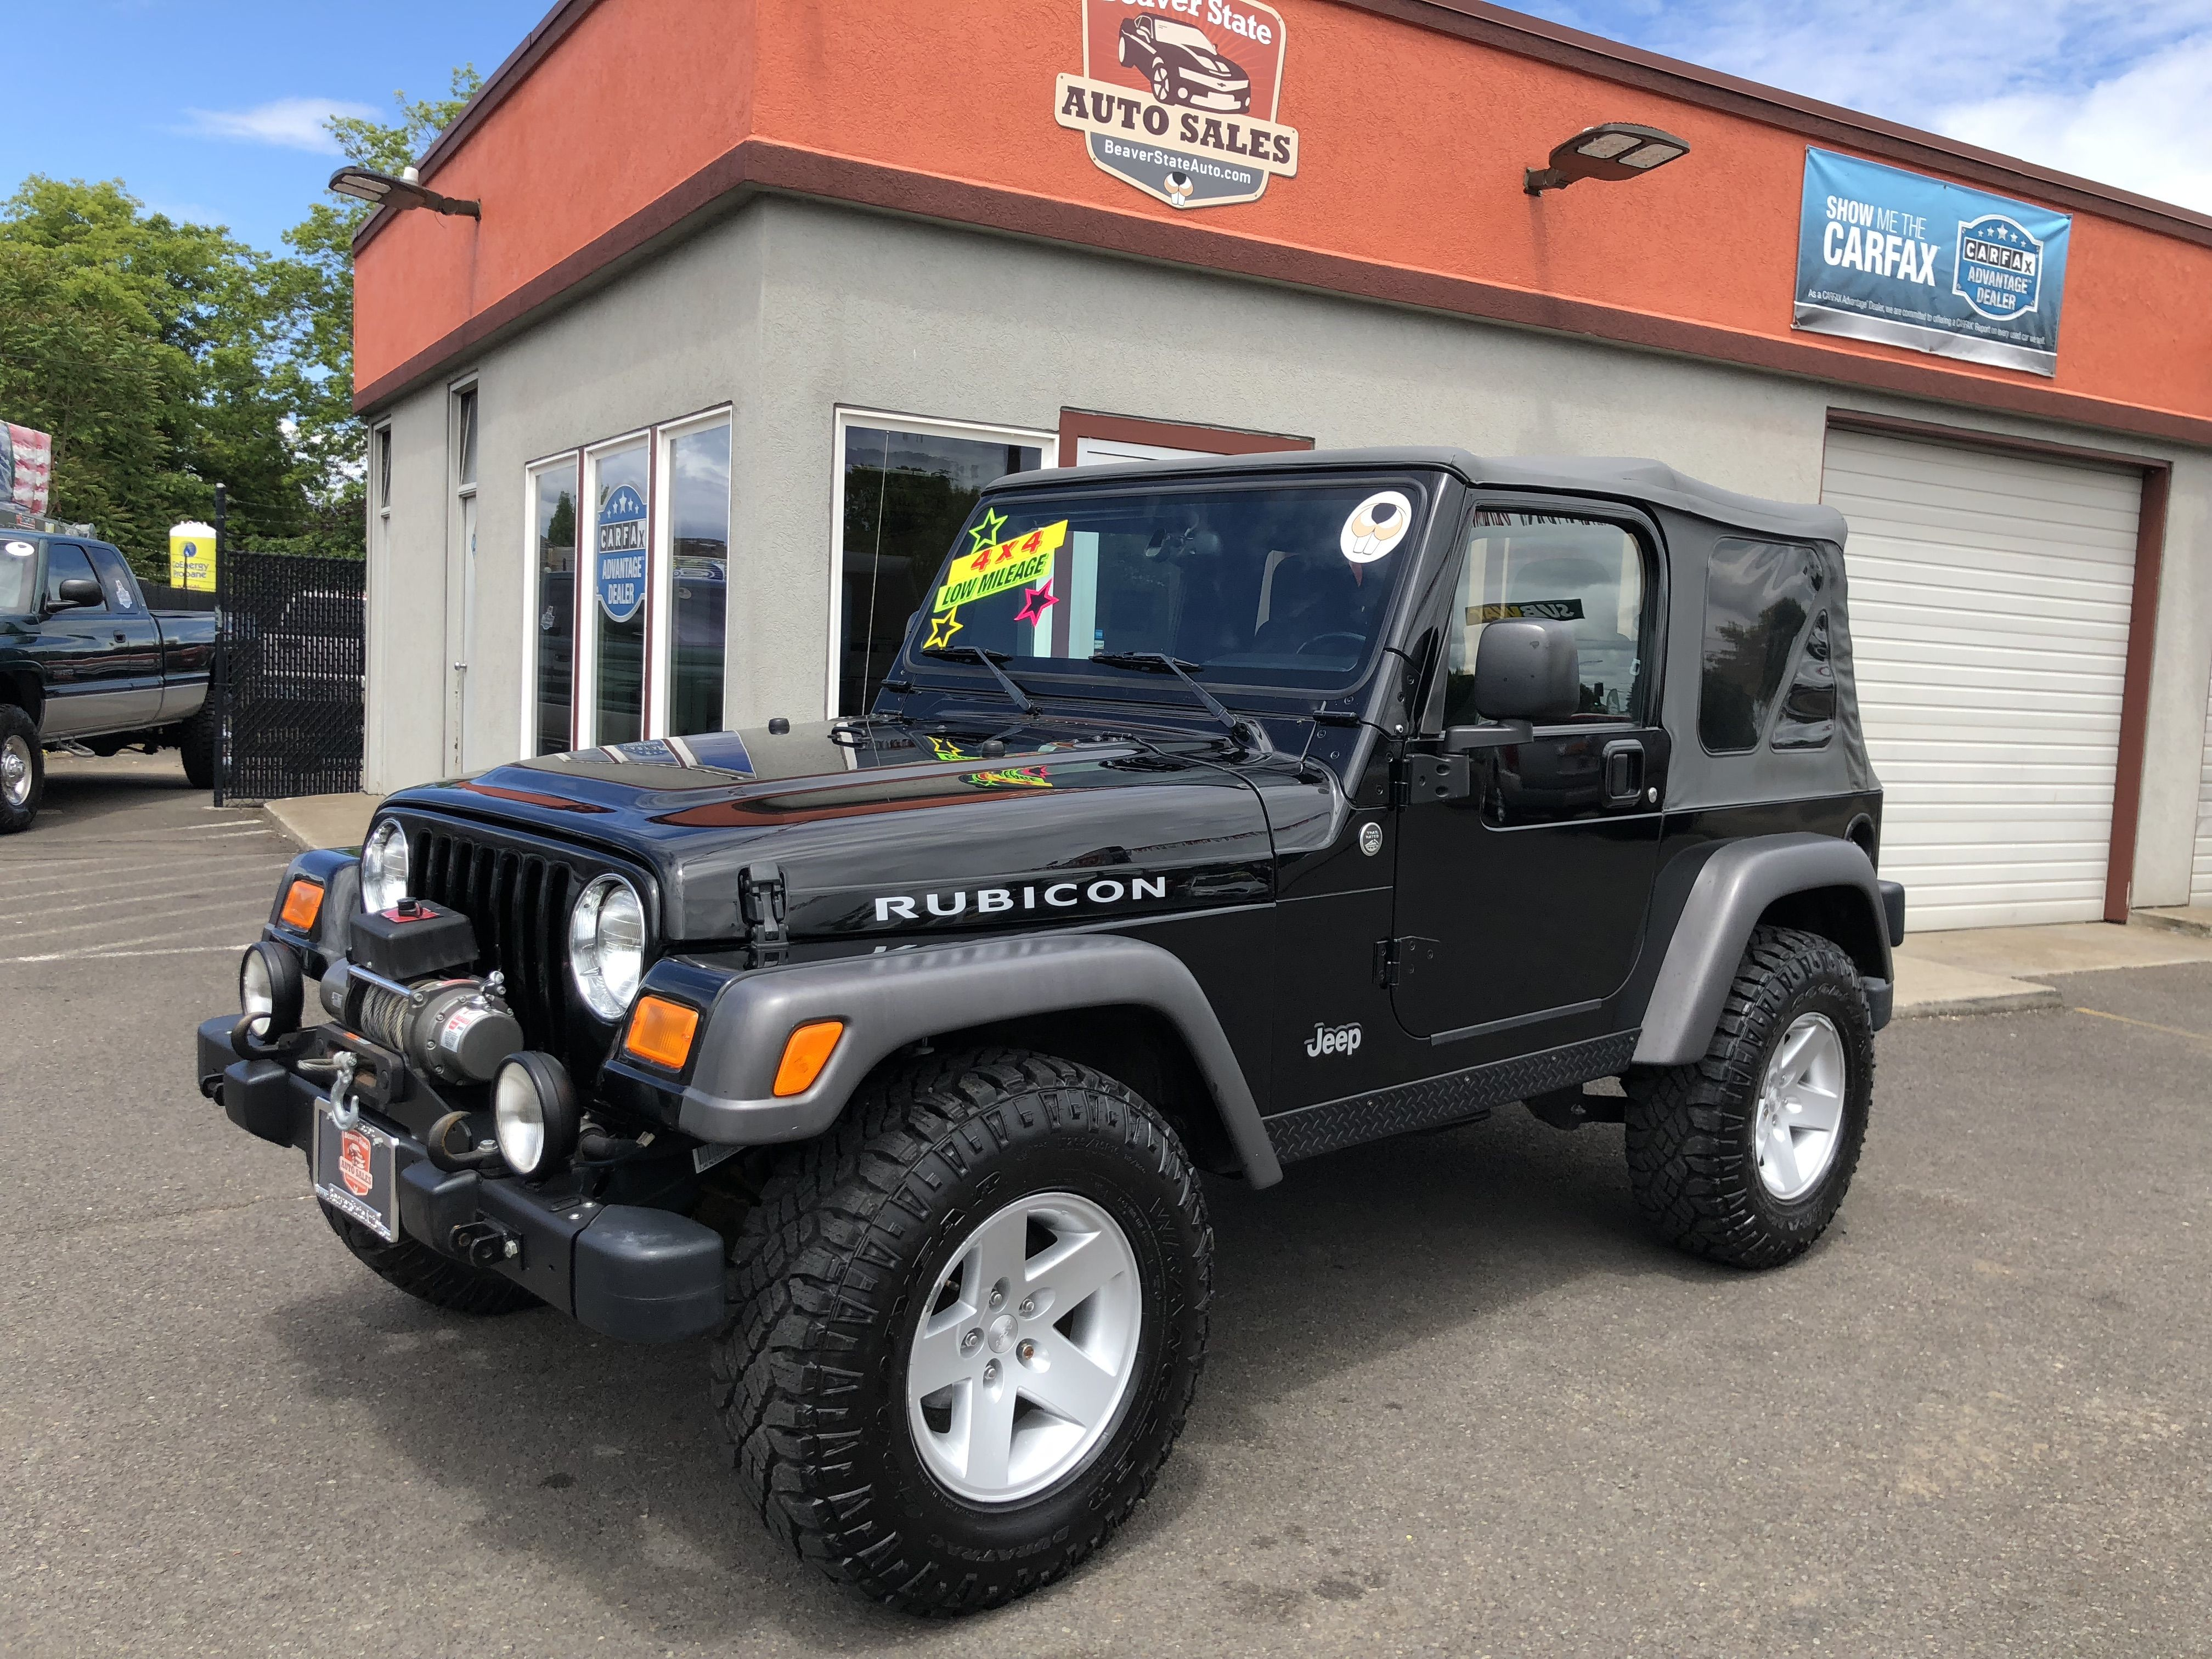 2005 Jeep Wrangler Rubicon 2005 Jeep Wrangler Jeep Wrangler